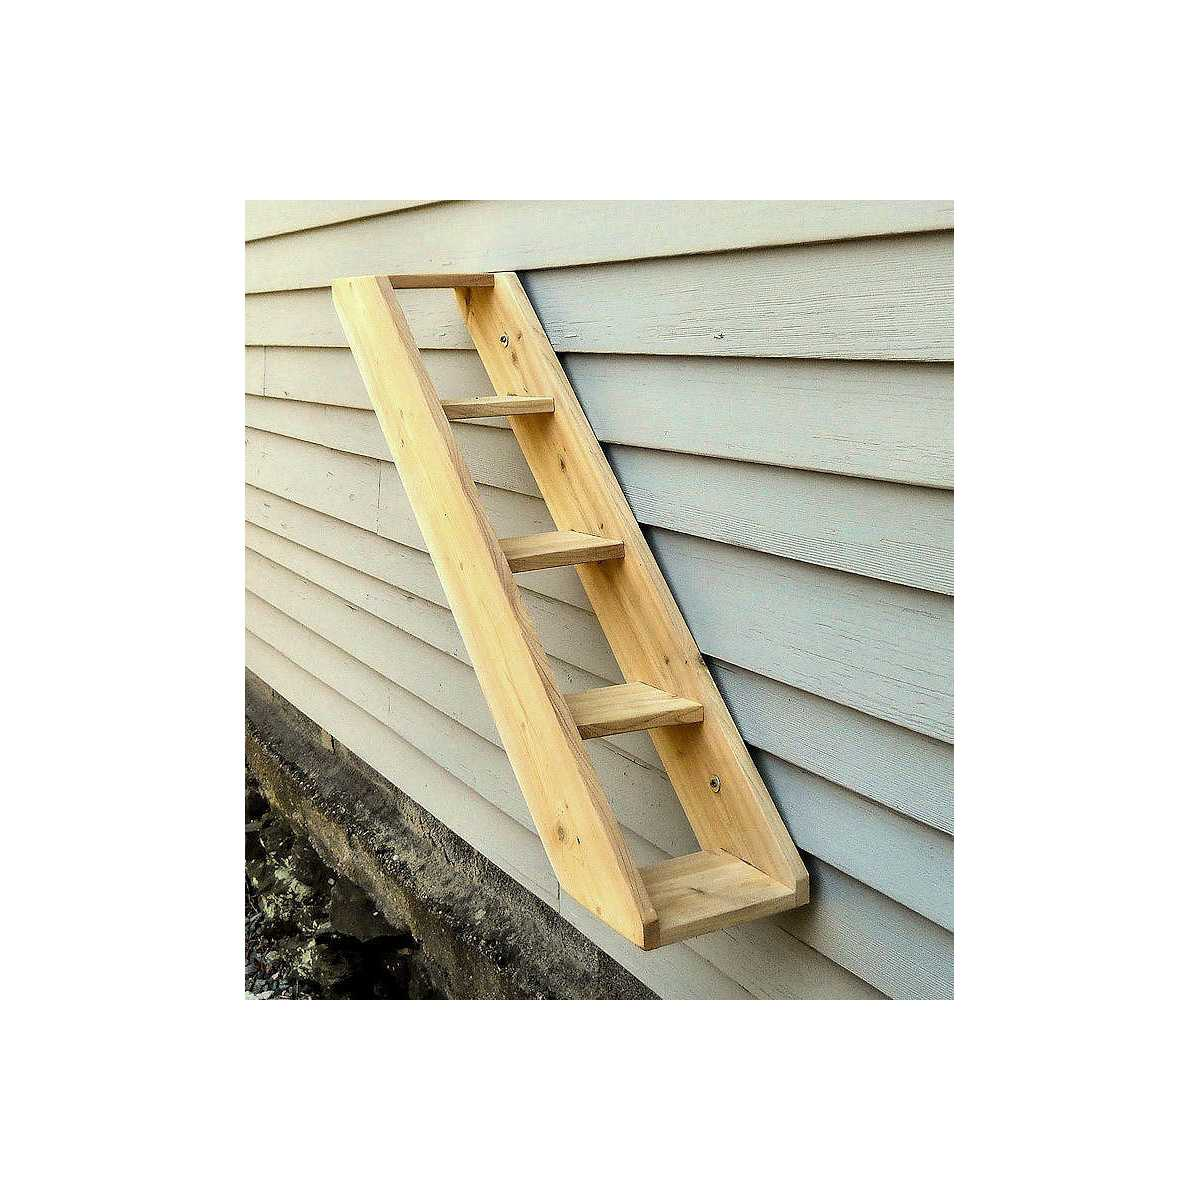 Outdoor Cedar Cat Wall System Stair Ladder Catsplay